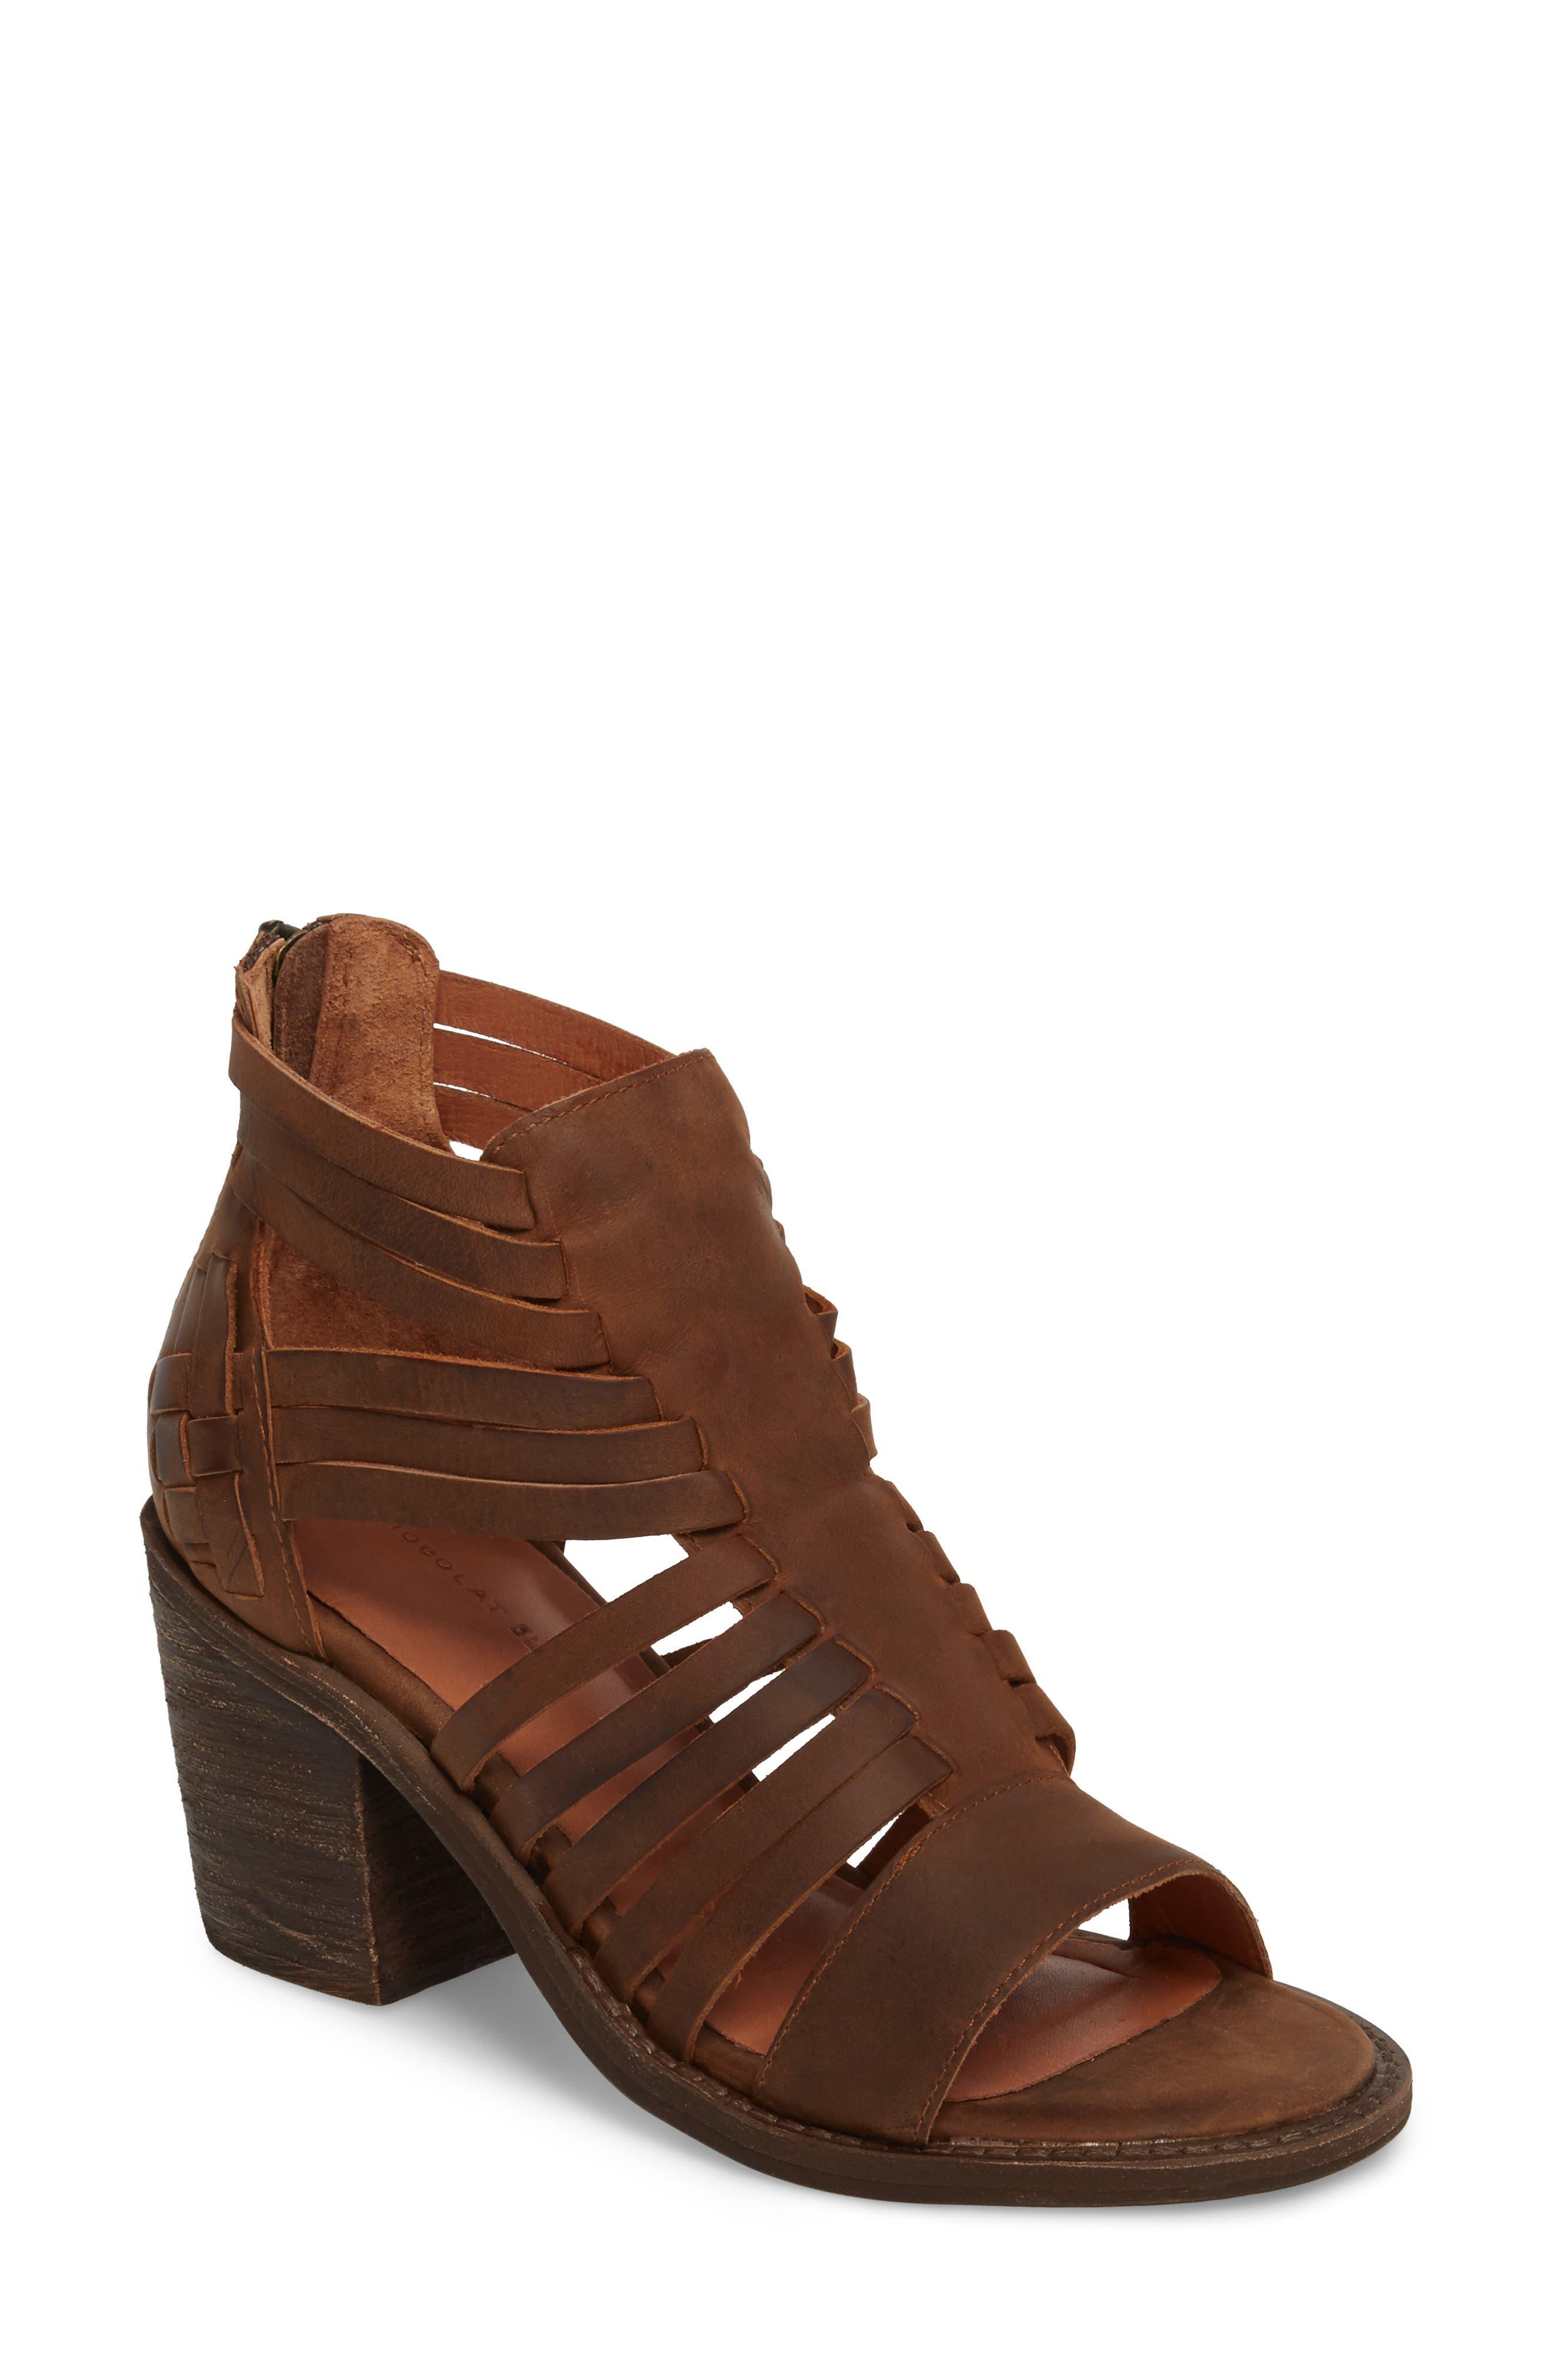 Felice Sandal,                             Main thumbnail 1, color,                             Brown Leather